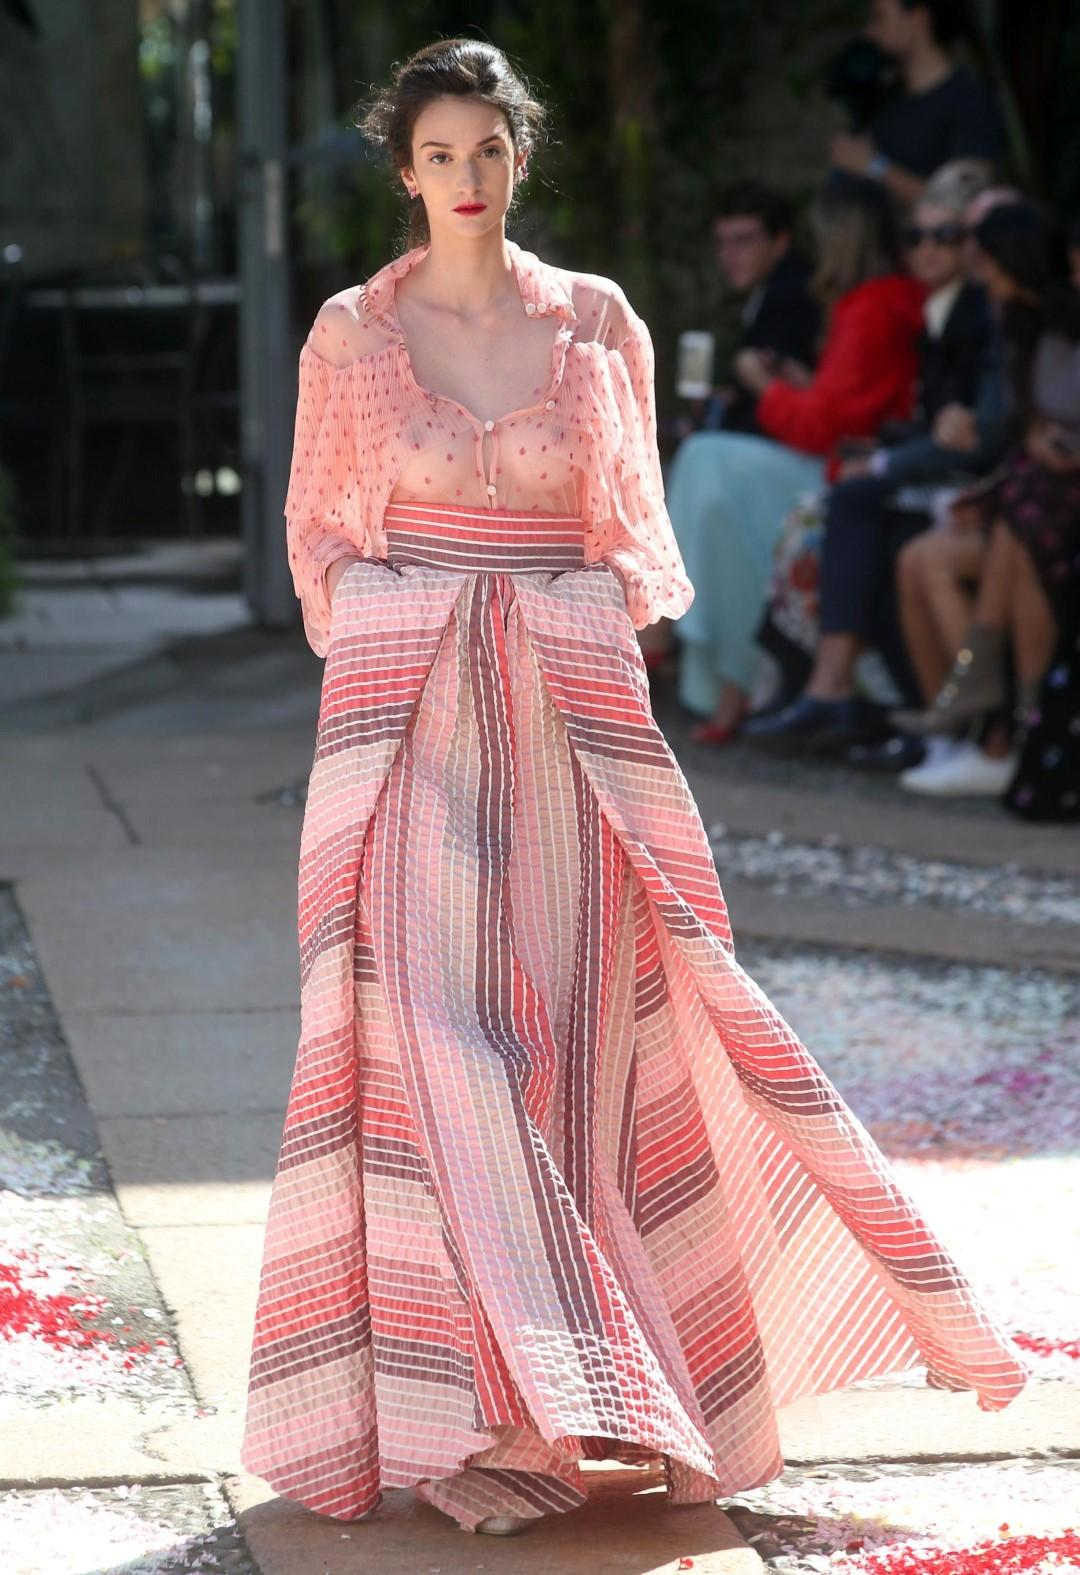 Moda: 50 sfumature di rosa